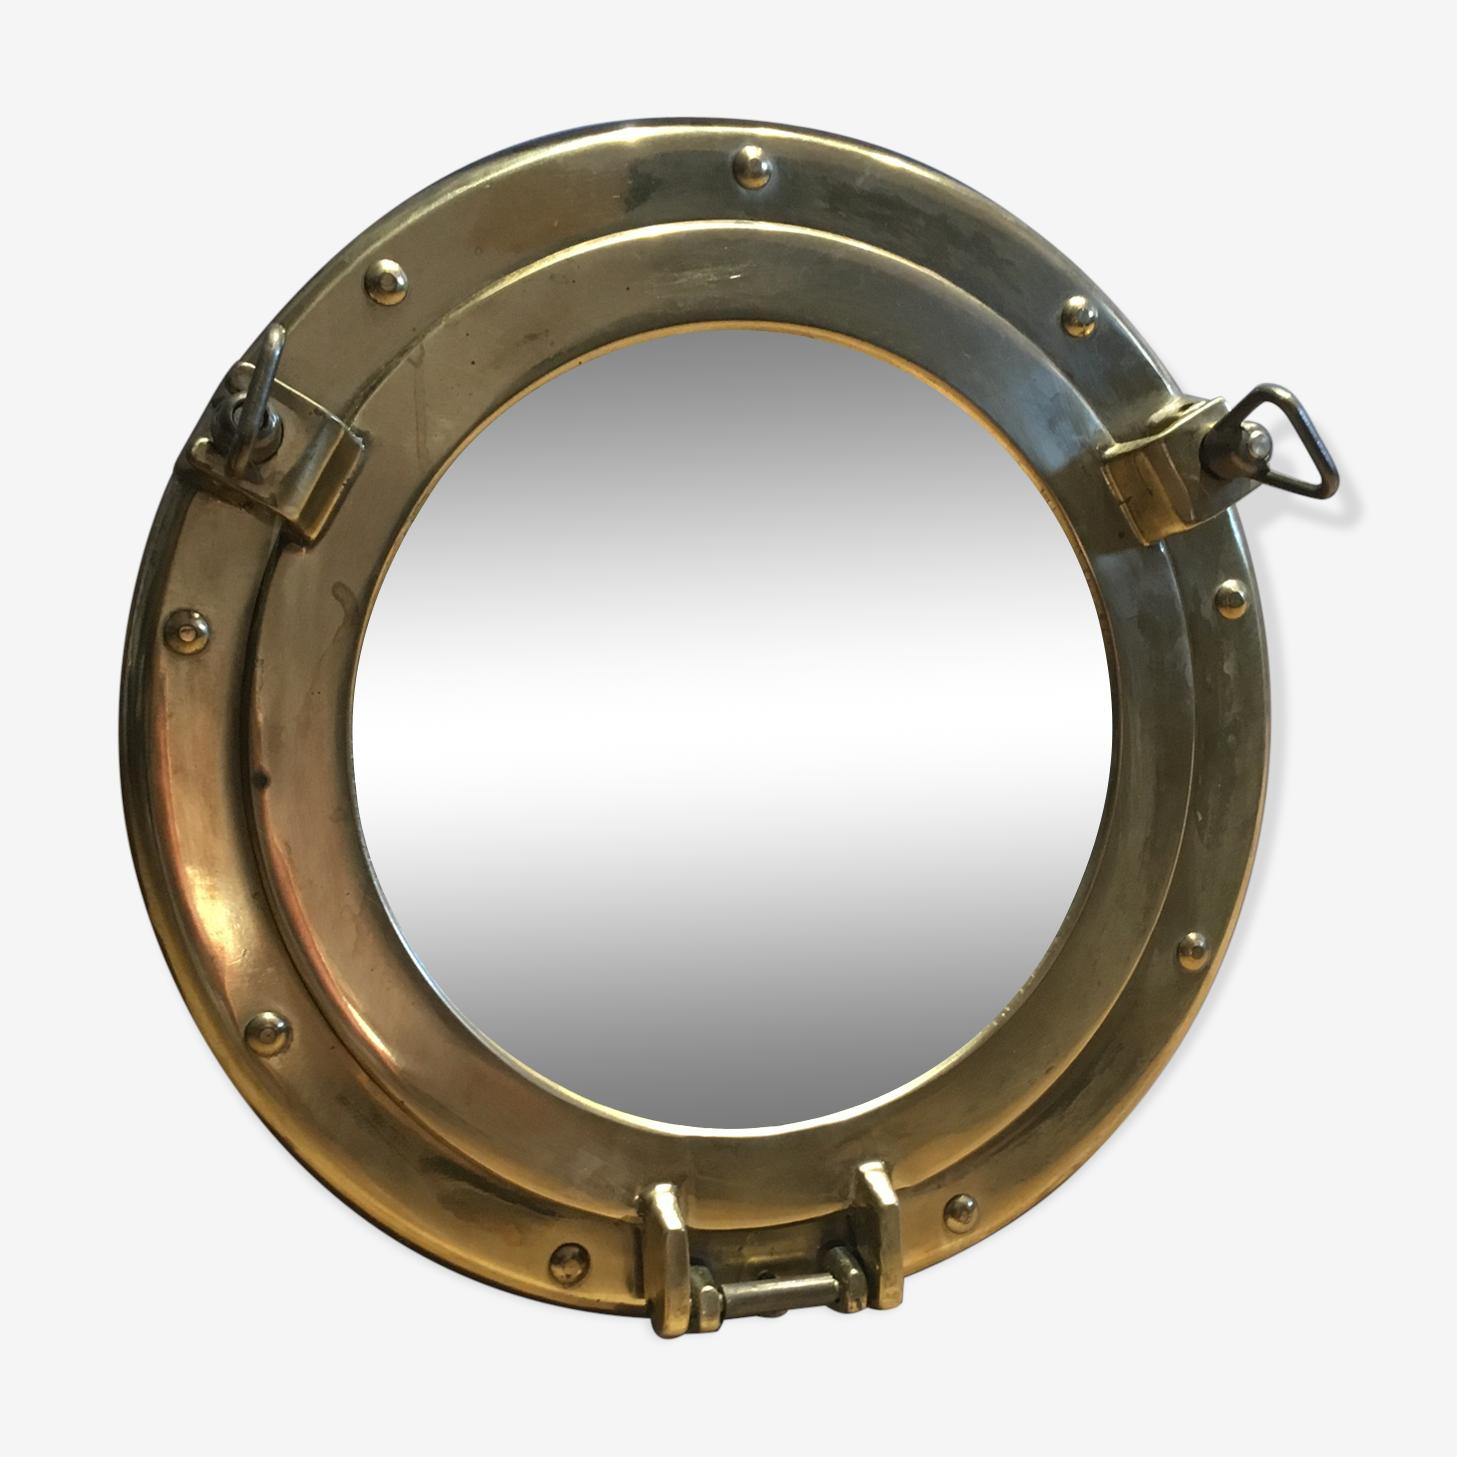 Porthole mirror 30x30cm